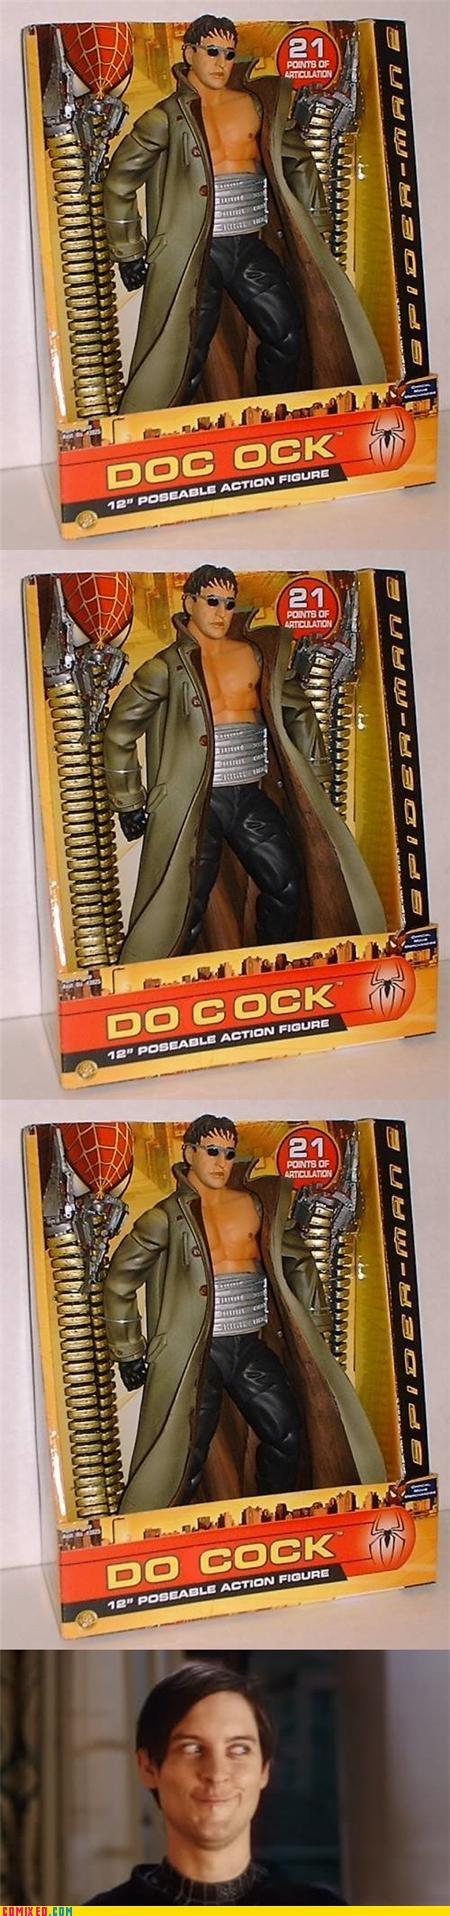 action figure doc ock Spider-Man TV - 4891666944